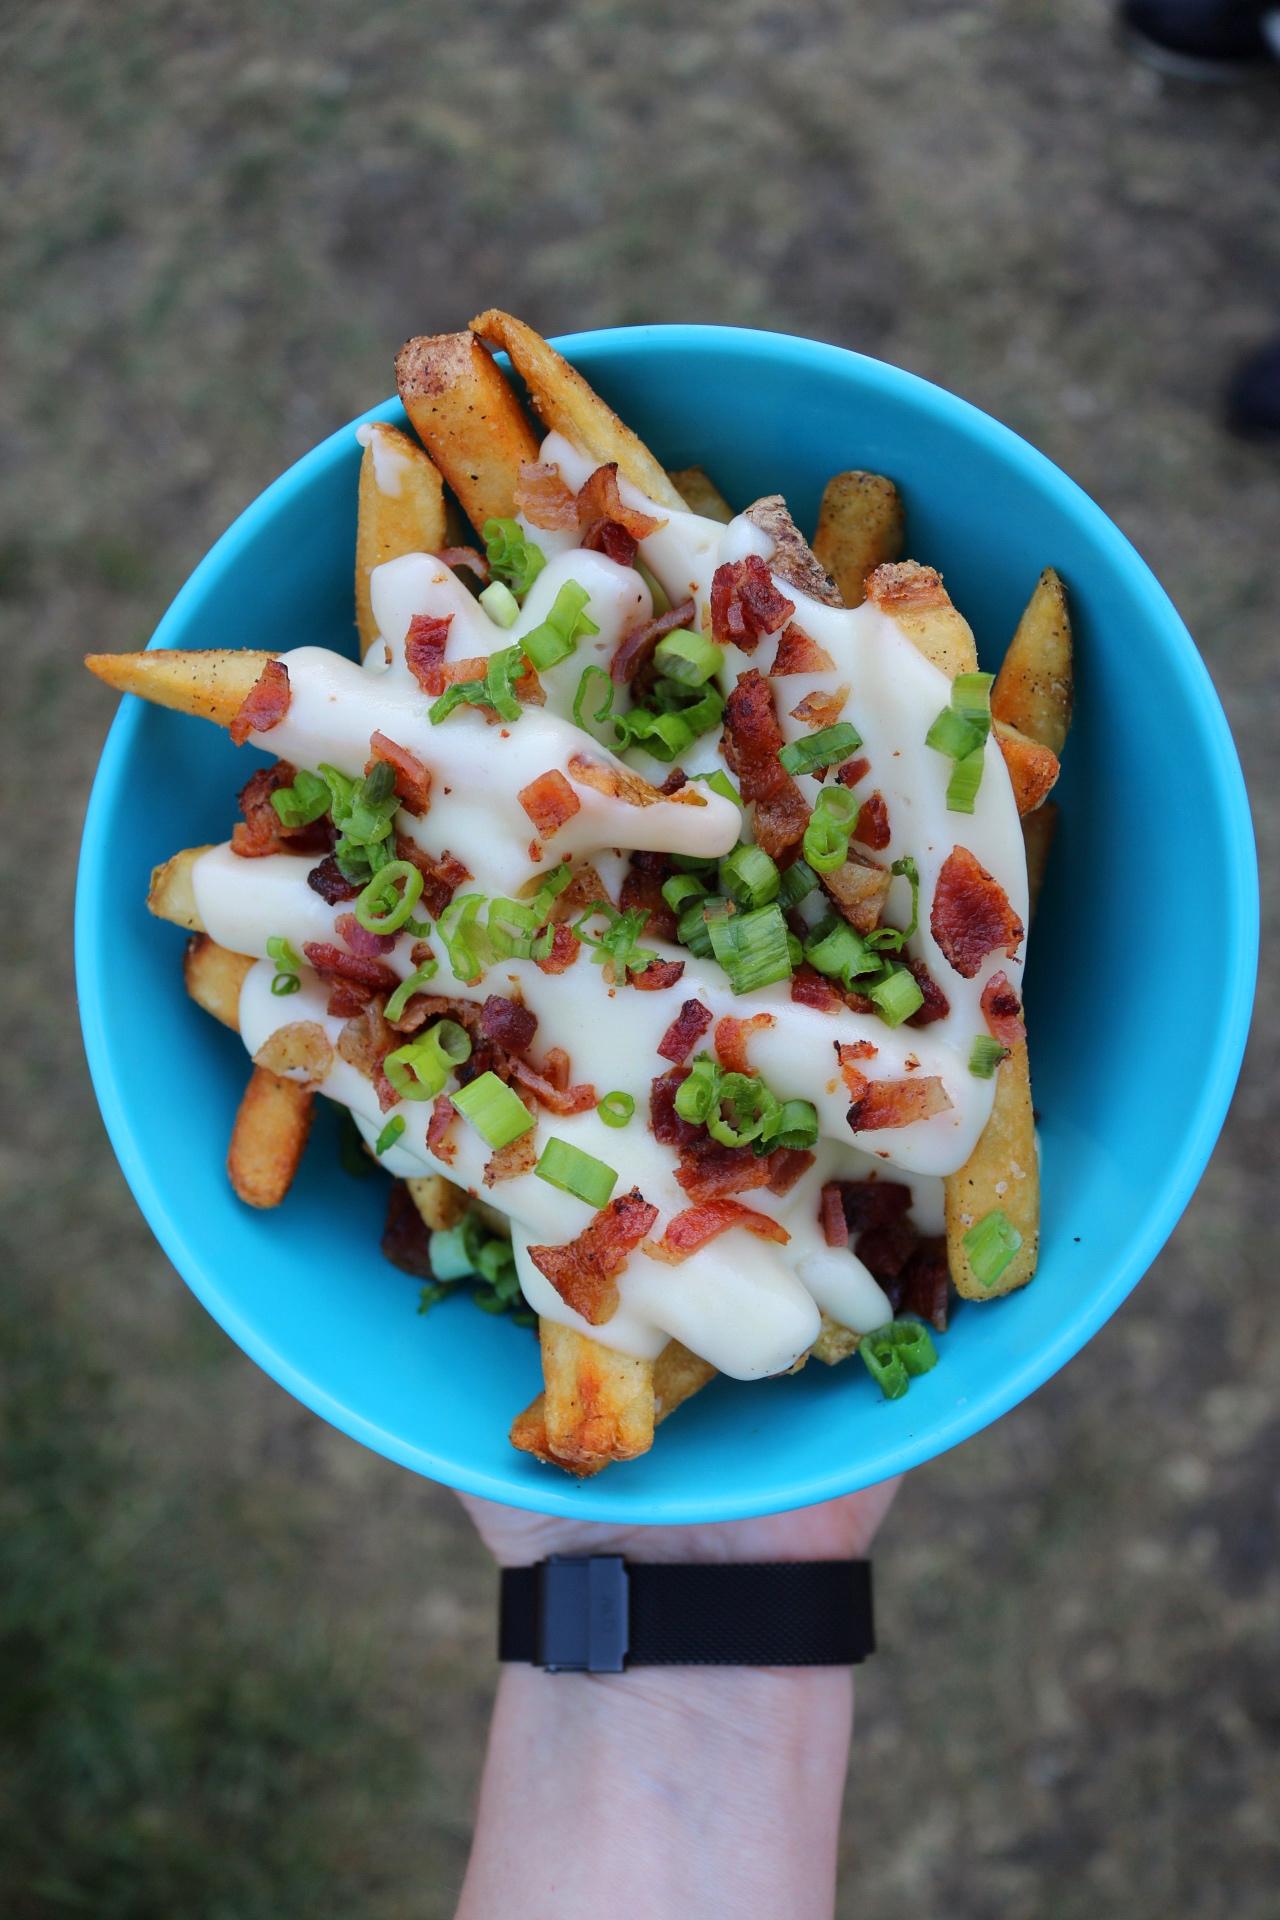 Loaded Fries The Springs BK